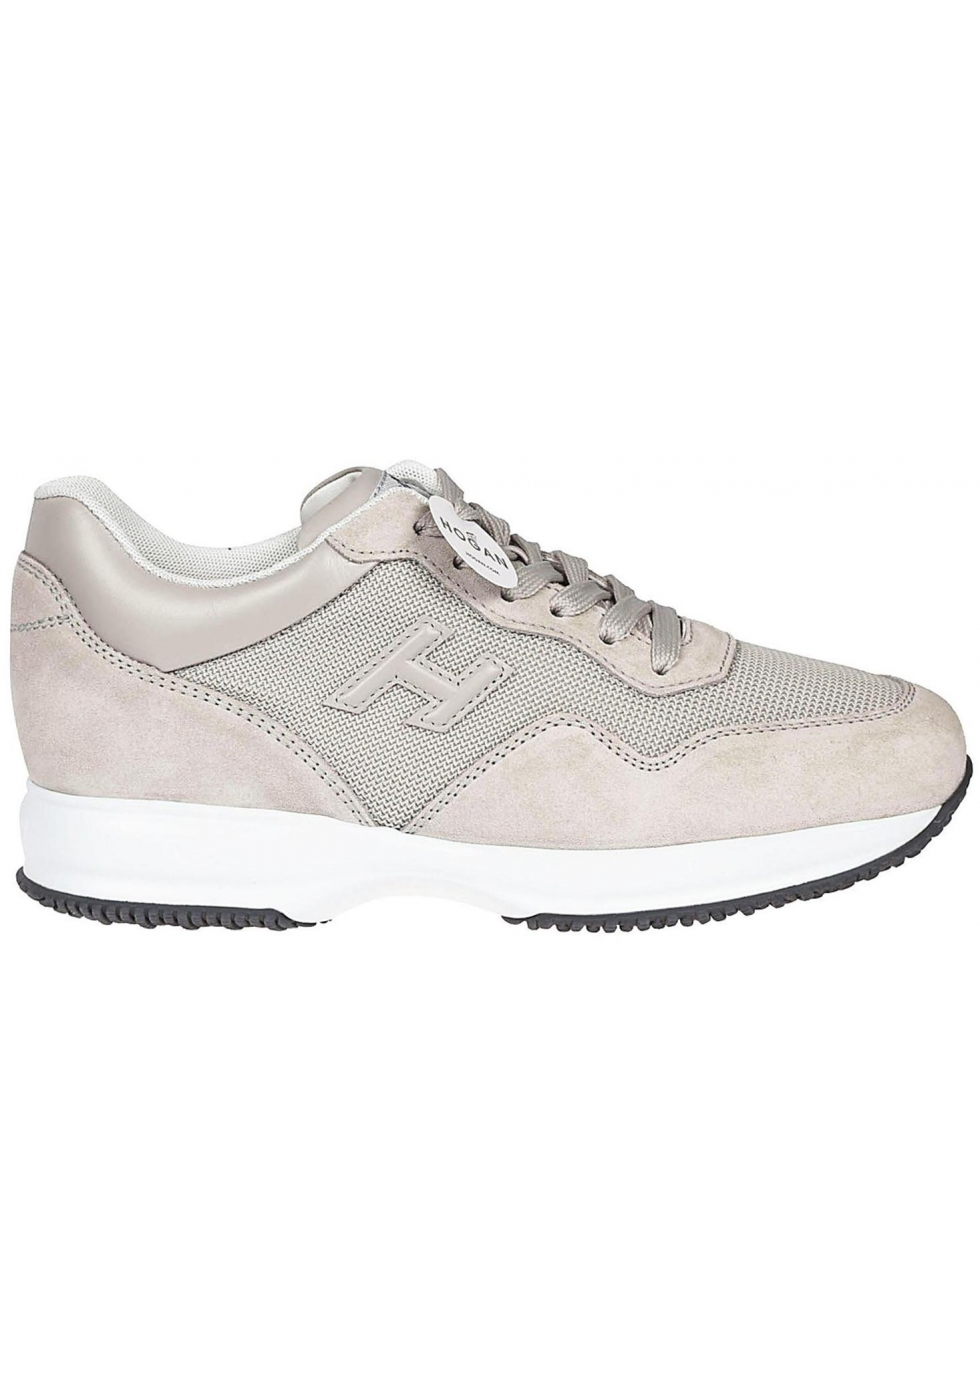 9ee27bdd44f7f Sneakers Hogan Interactive uomo in pelle scamosciata beige - Italian ...